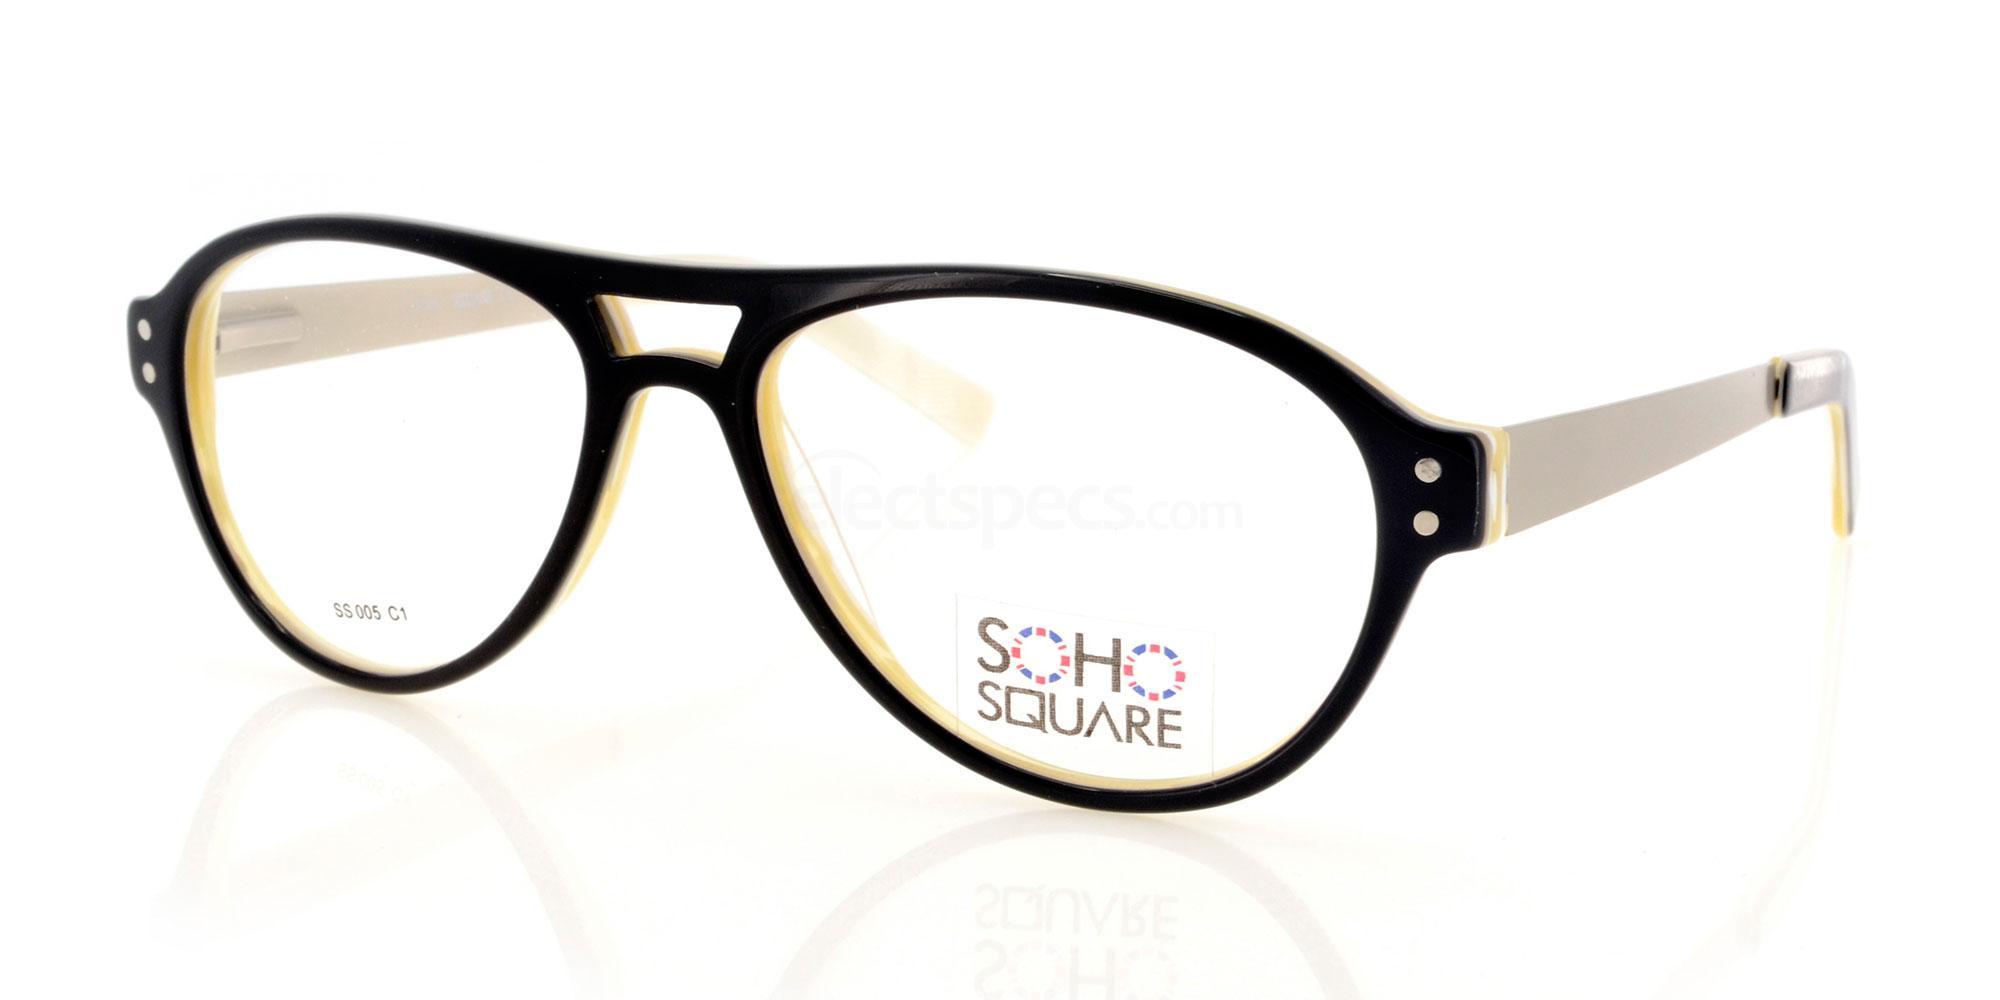 C1 SS 005 Glasses, Soho Square